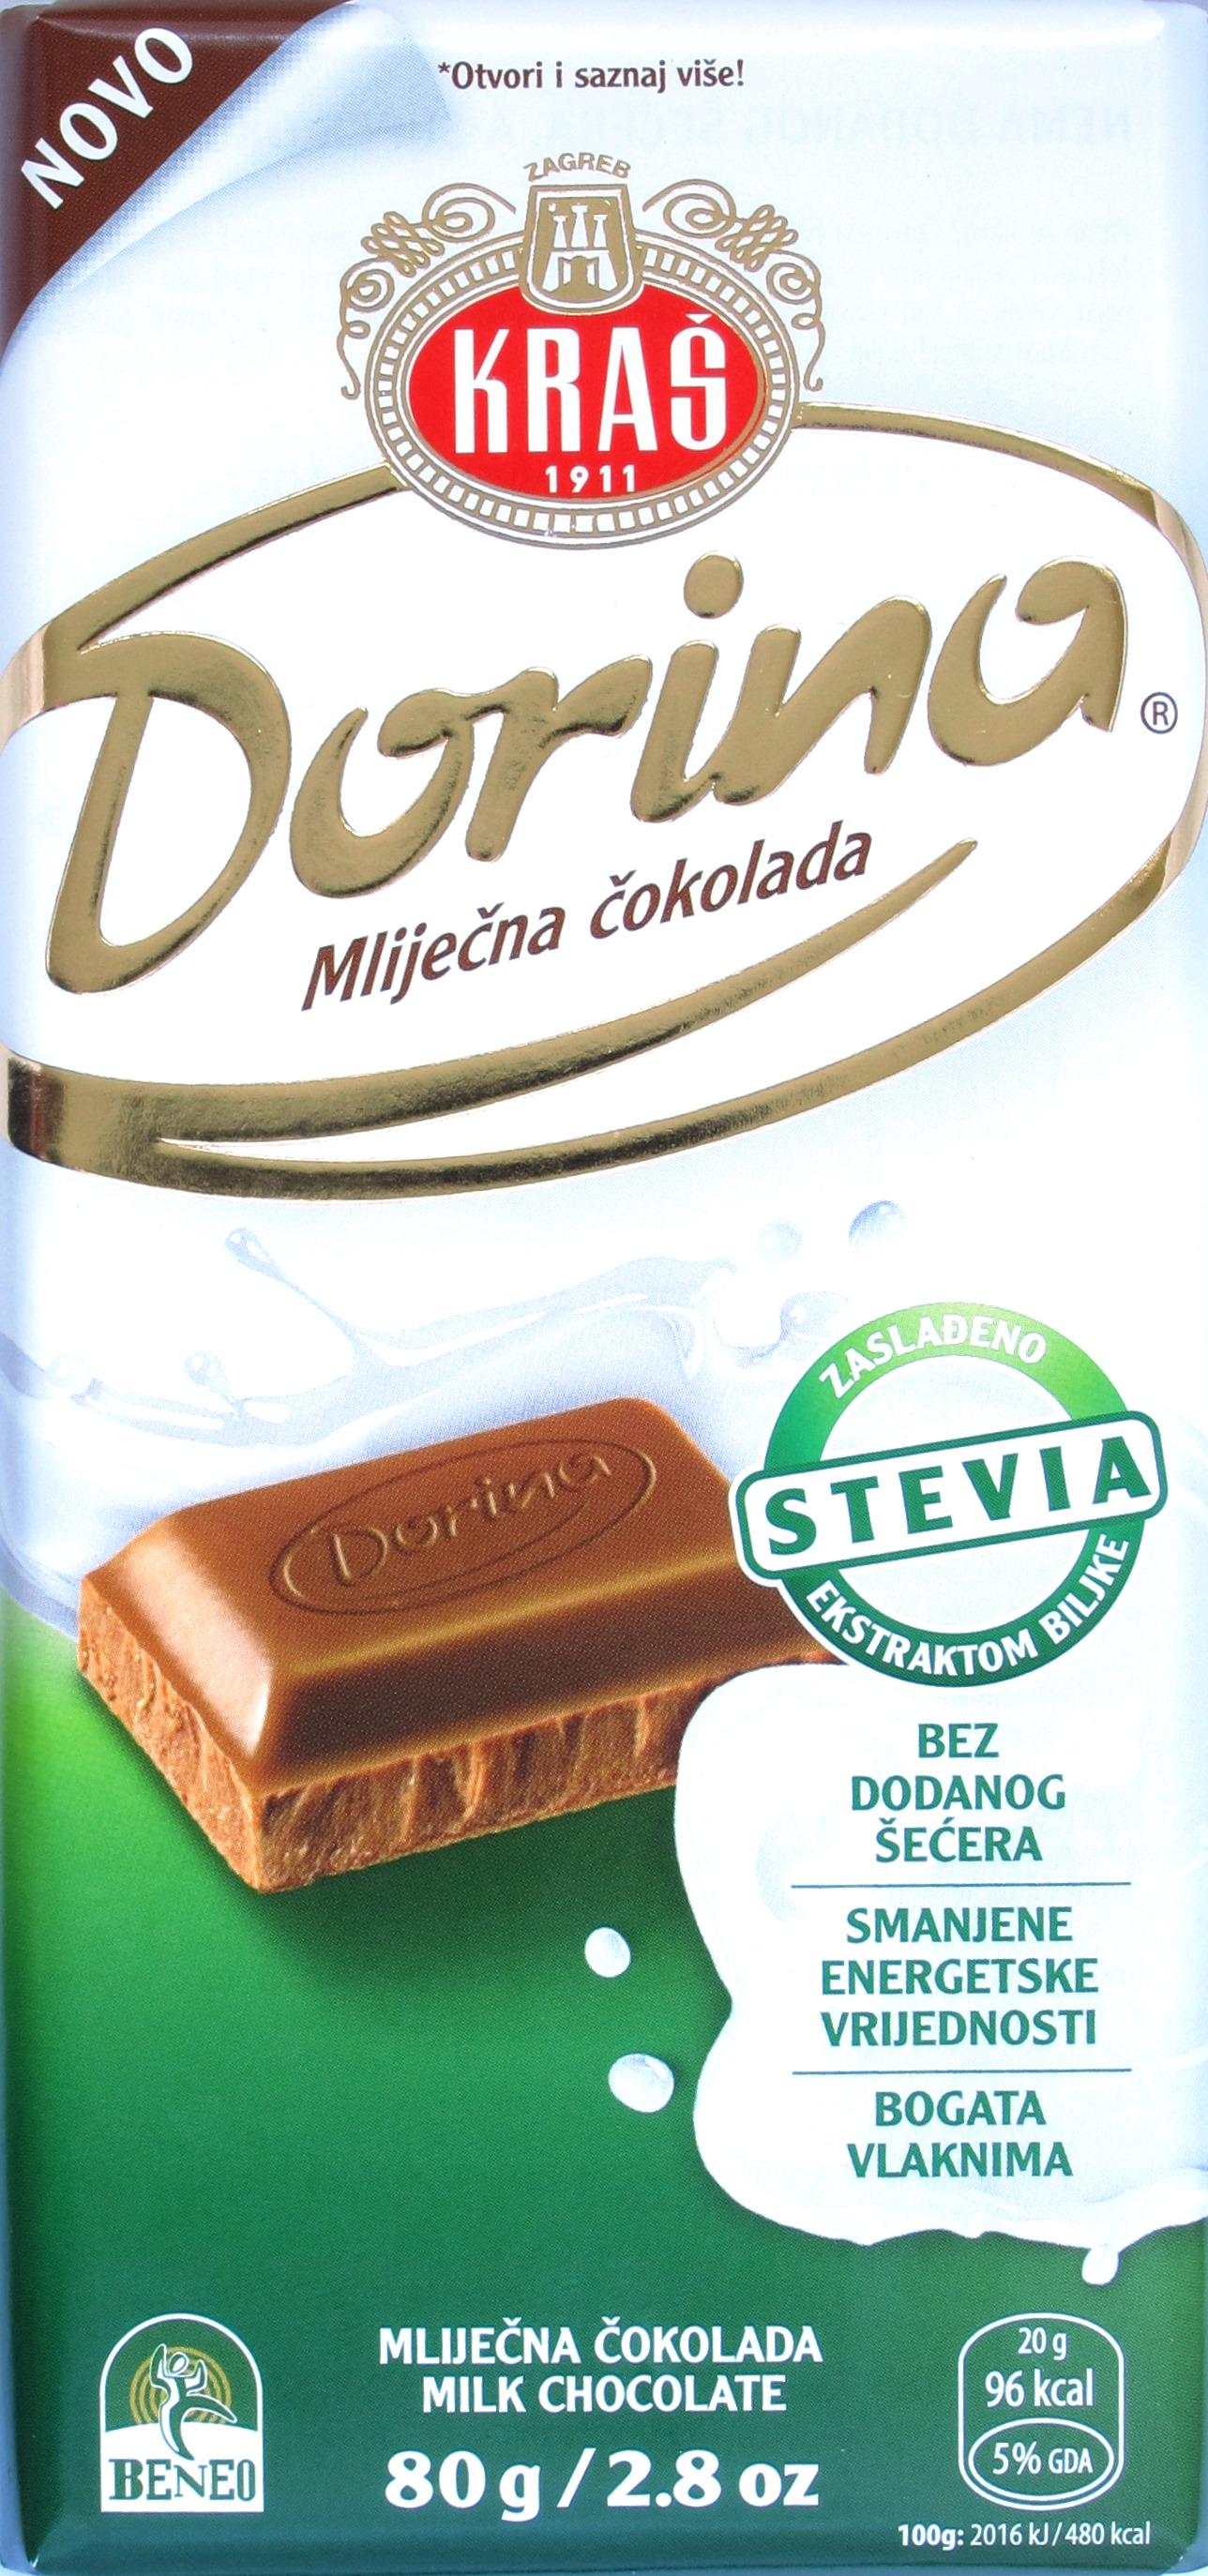 Kraš Stevia Milchschokolade 32%, Packung